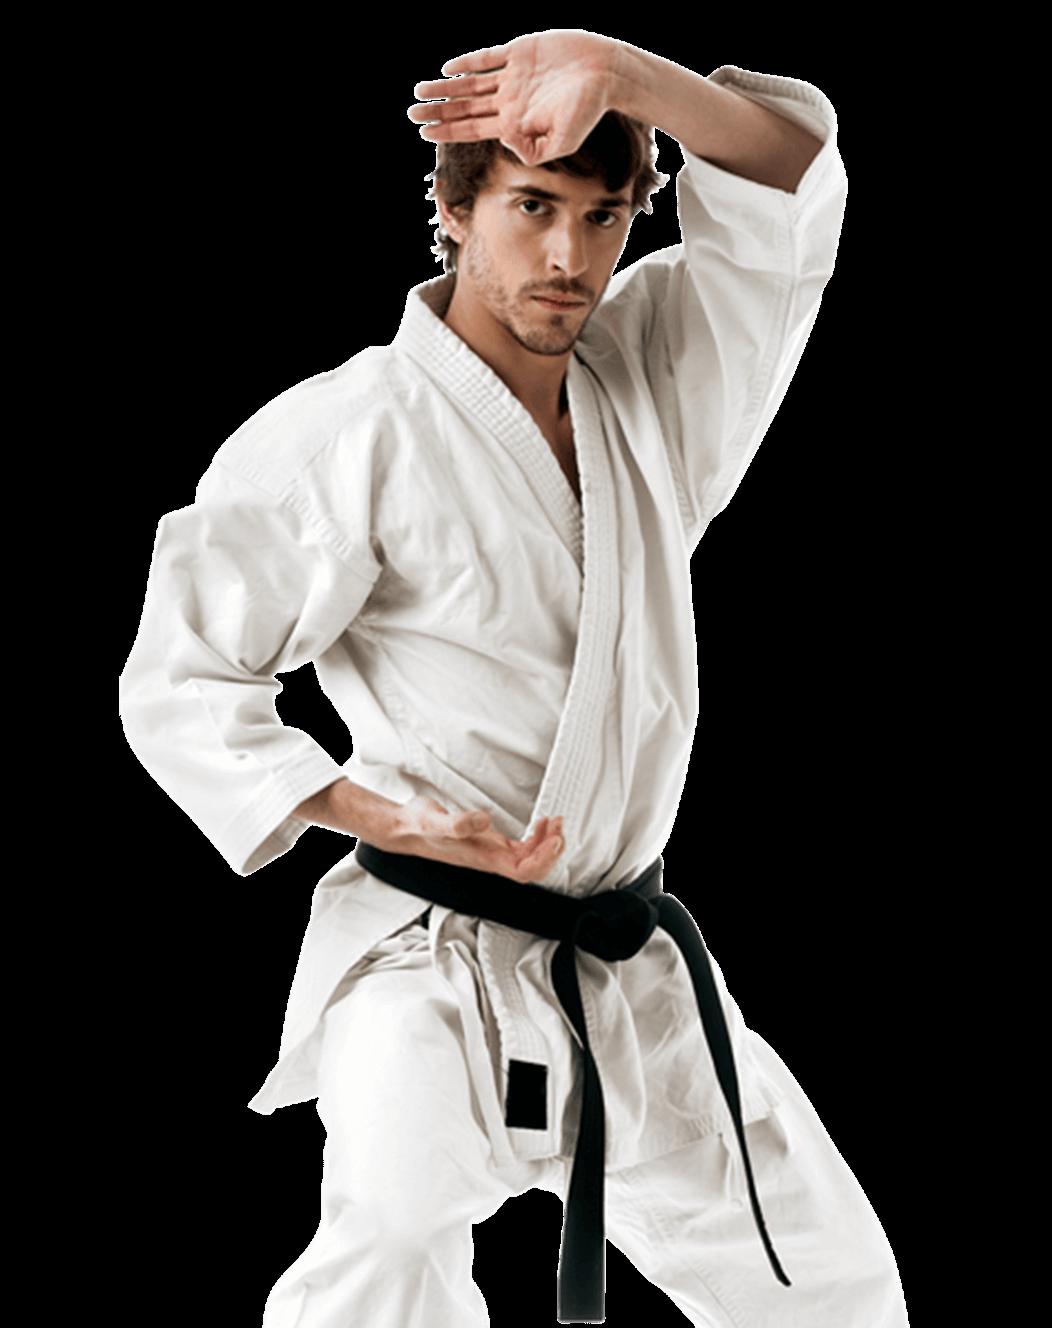 Master Jim Richard Savannah Black Belt Martial Arts Academy